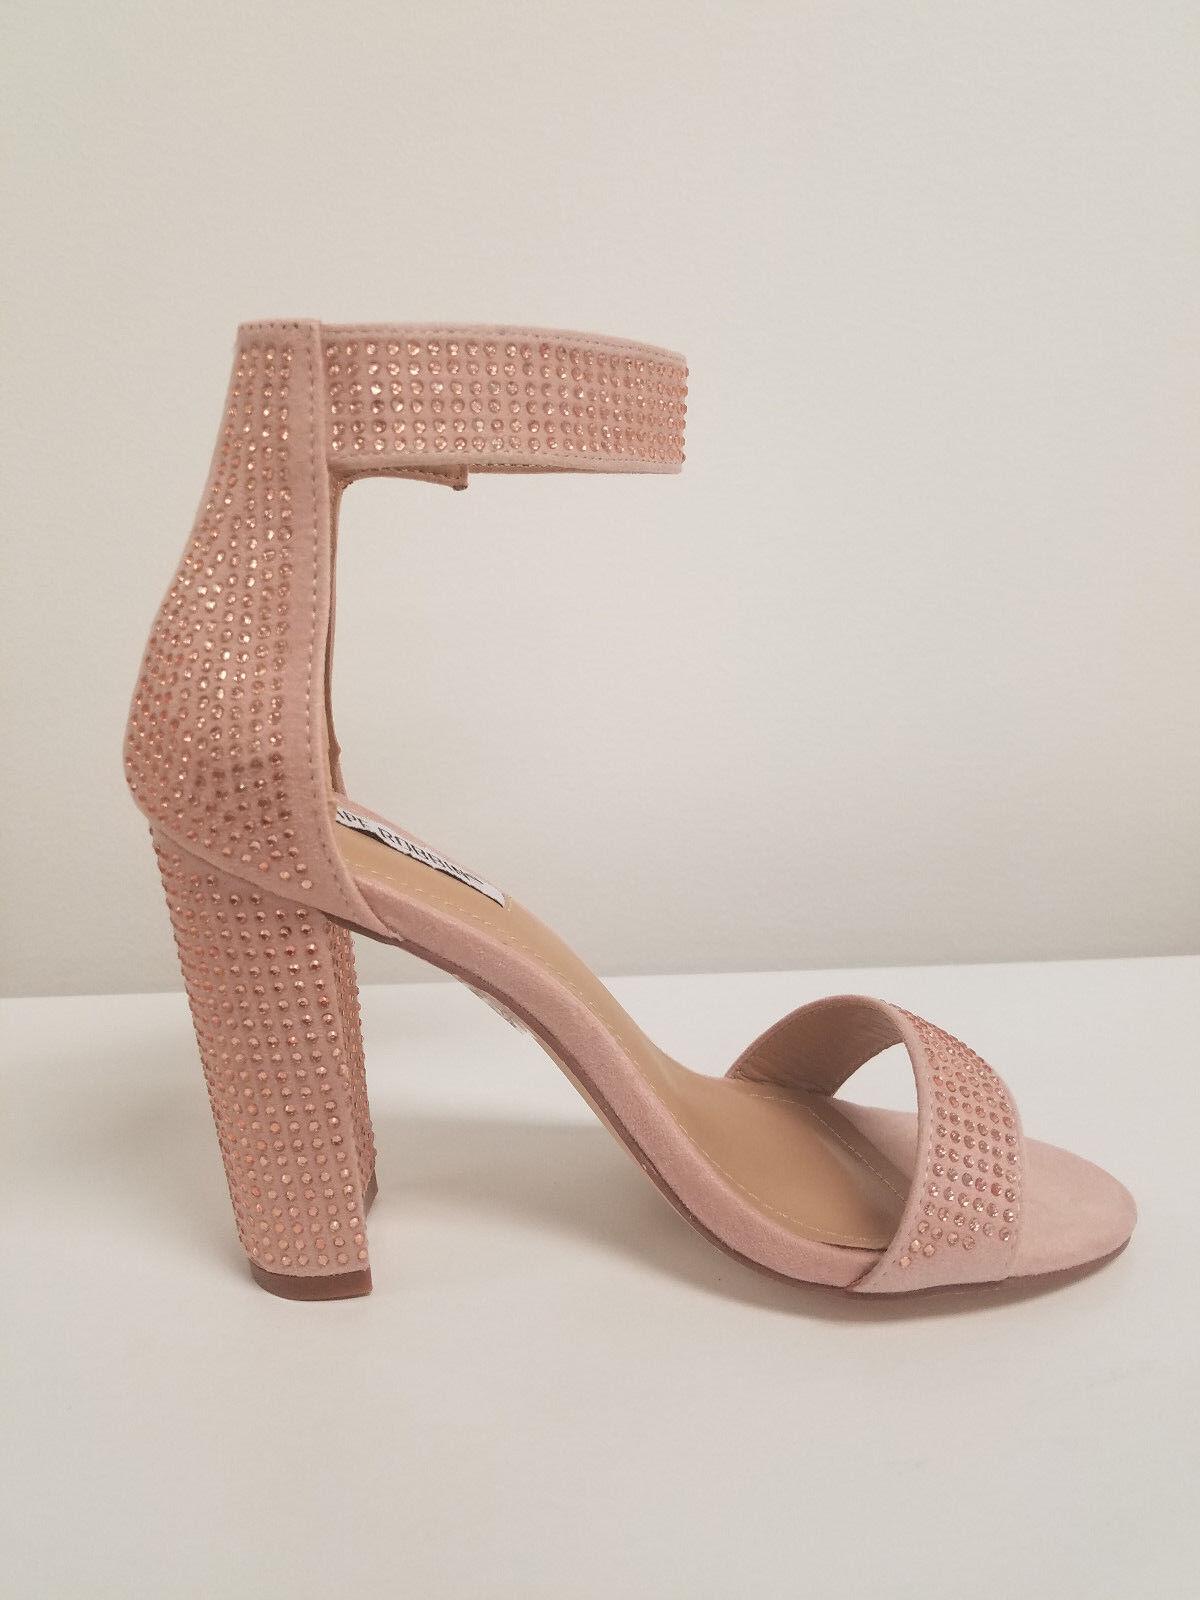 bluesh Pink Rhinestone Embellished Chunky Heels